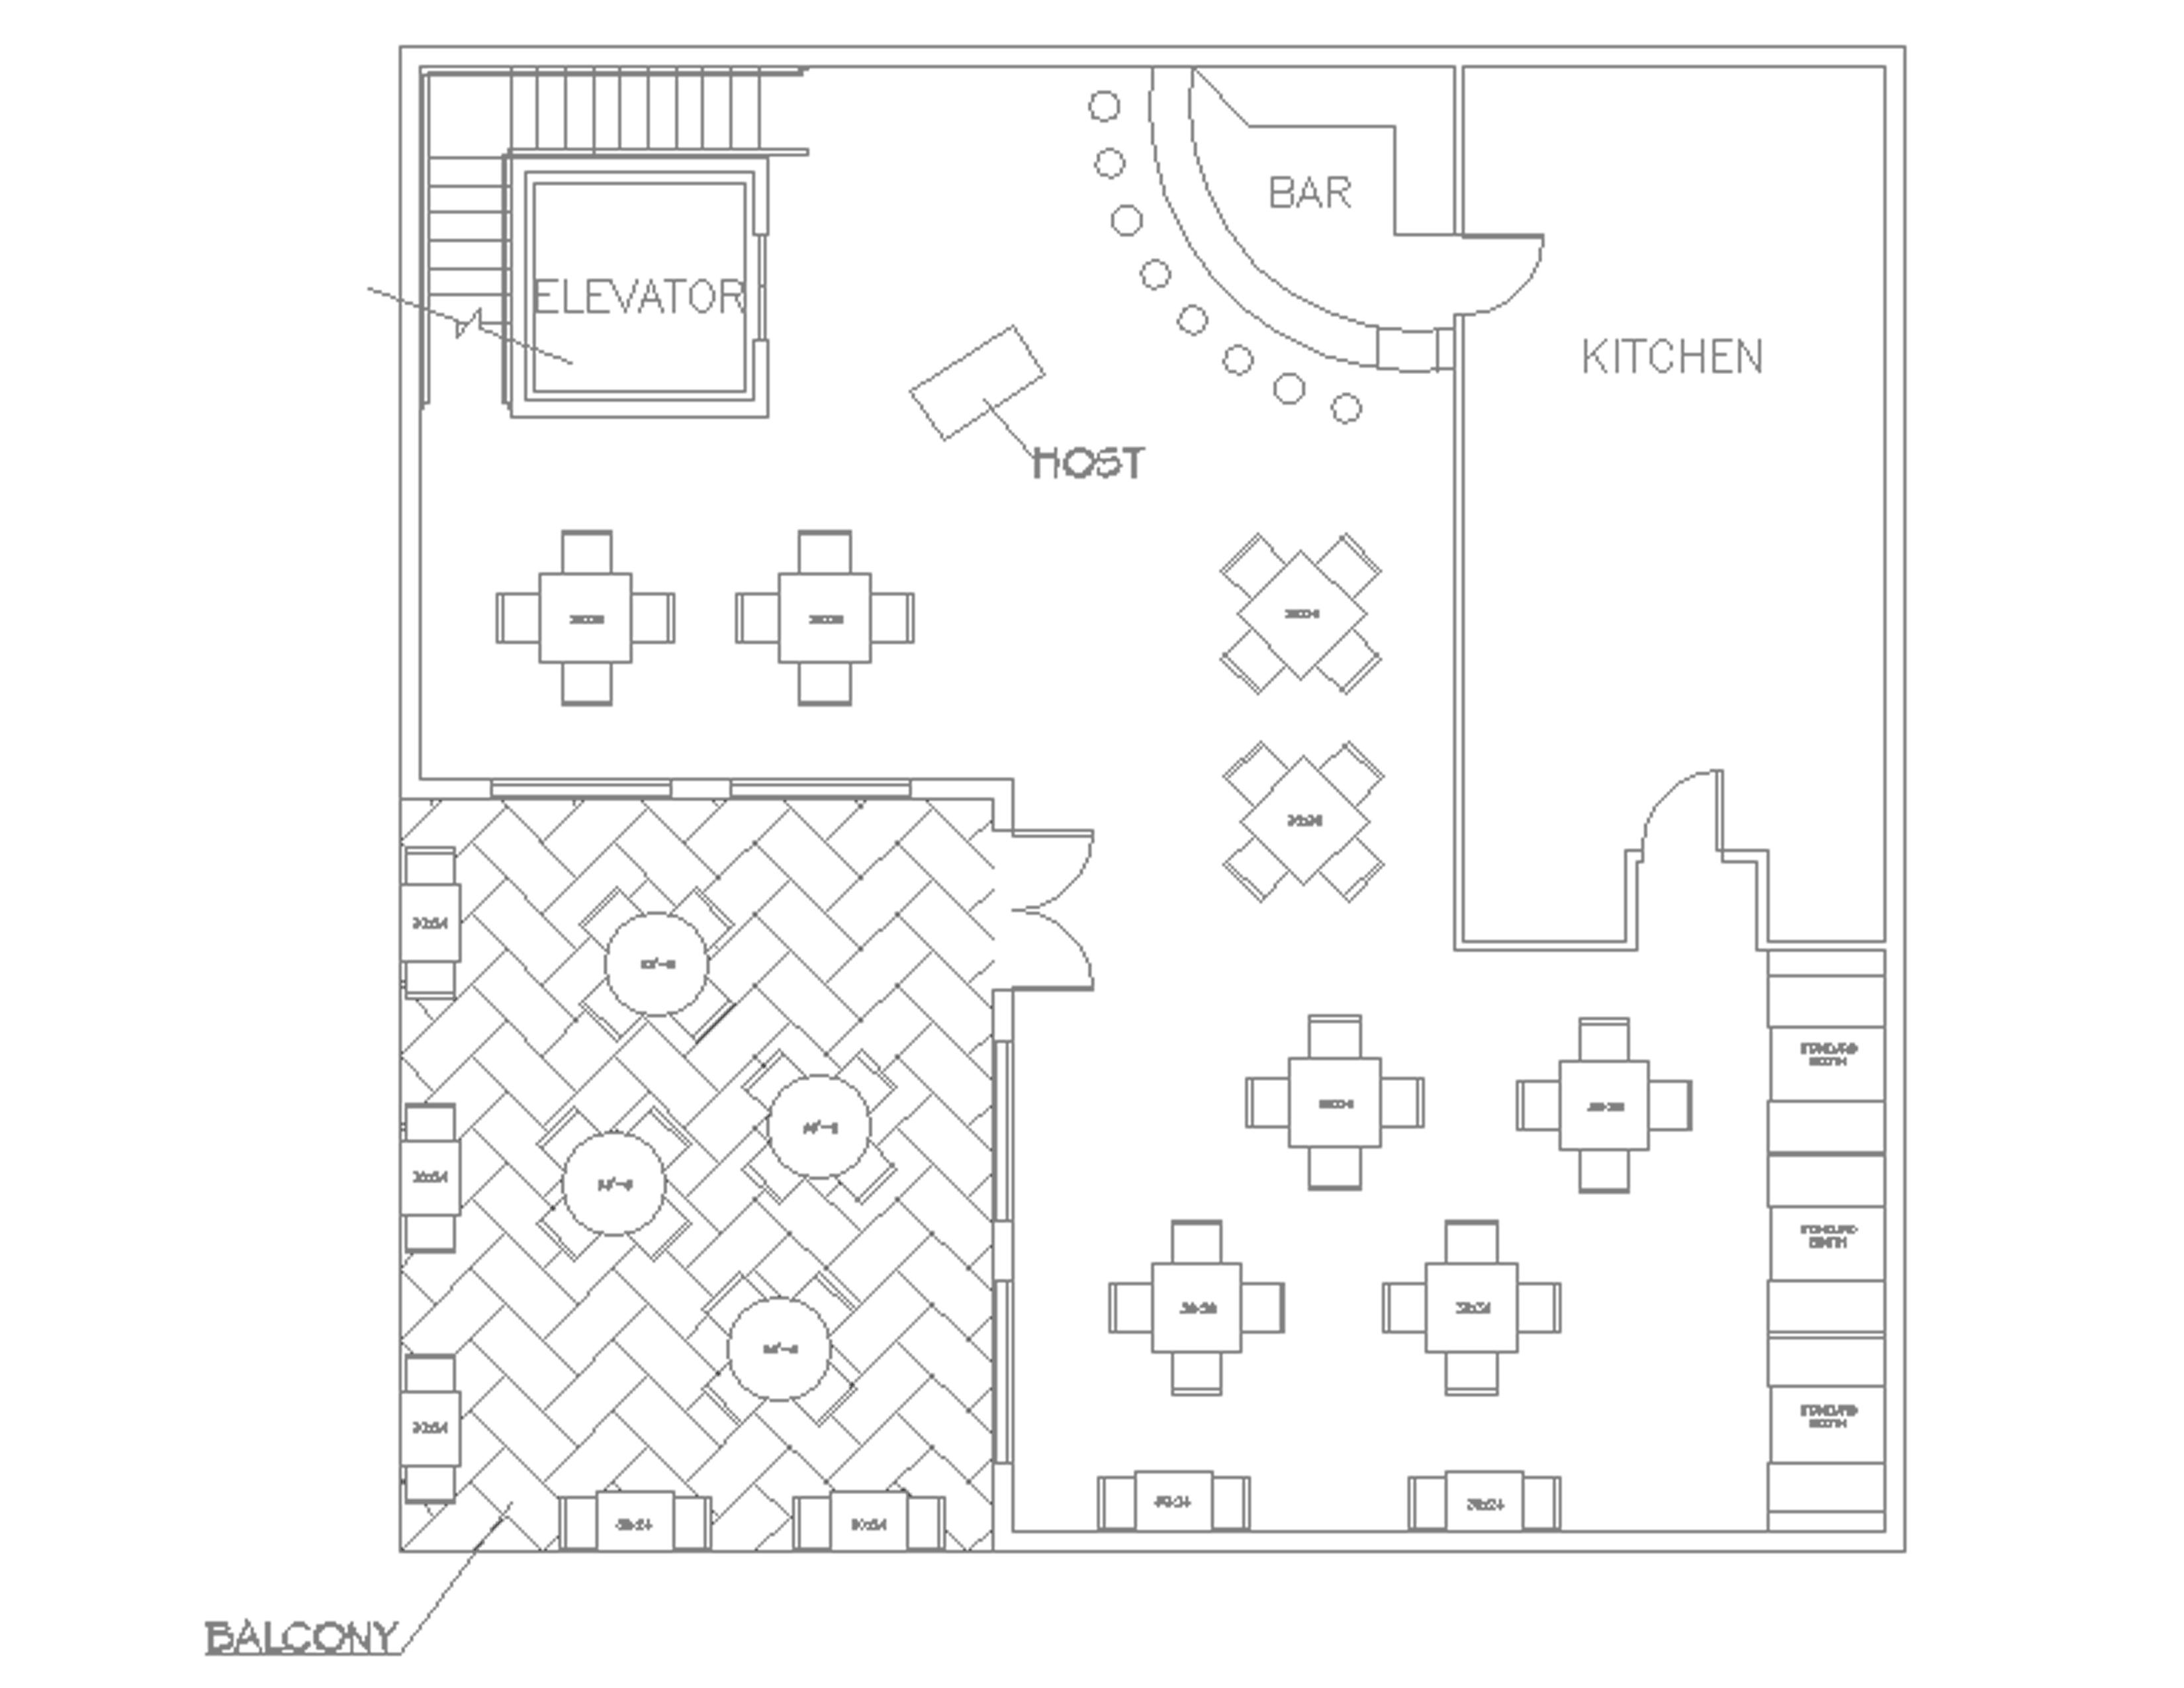 2nd Floor Furniture